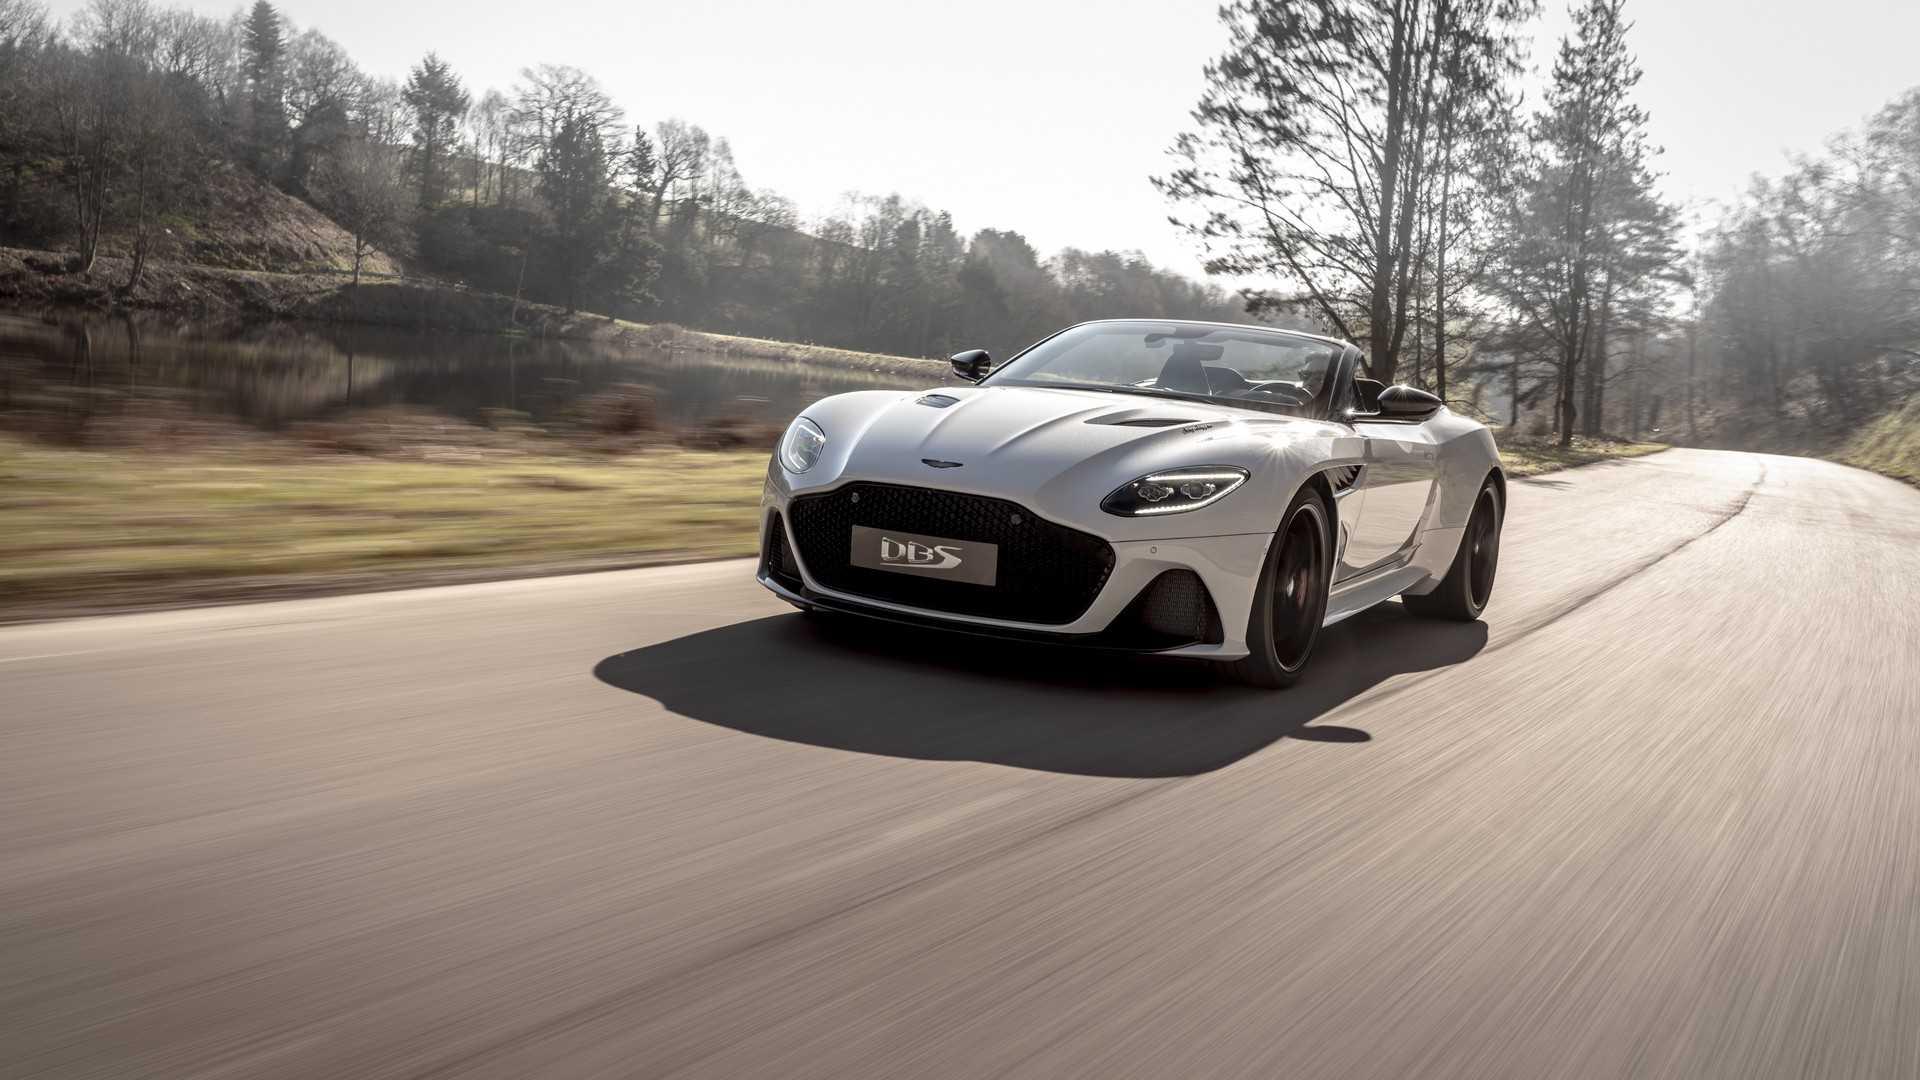 2019 Aston Martin DBS Superleggera Volante debuts: Aston Martin's most fastest car